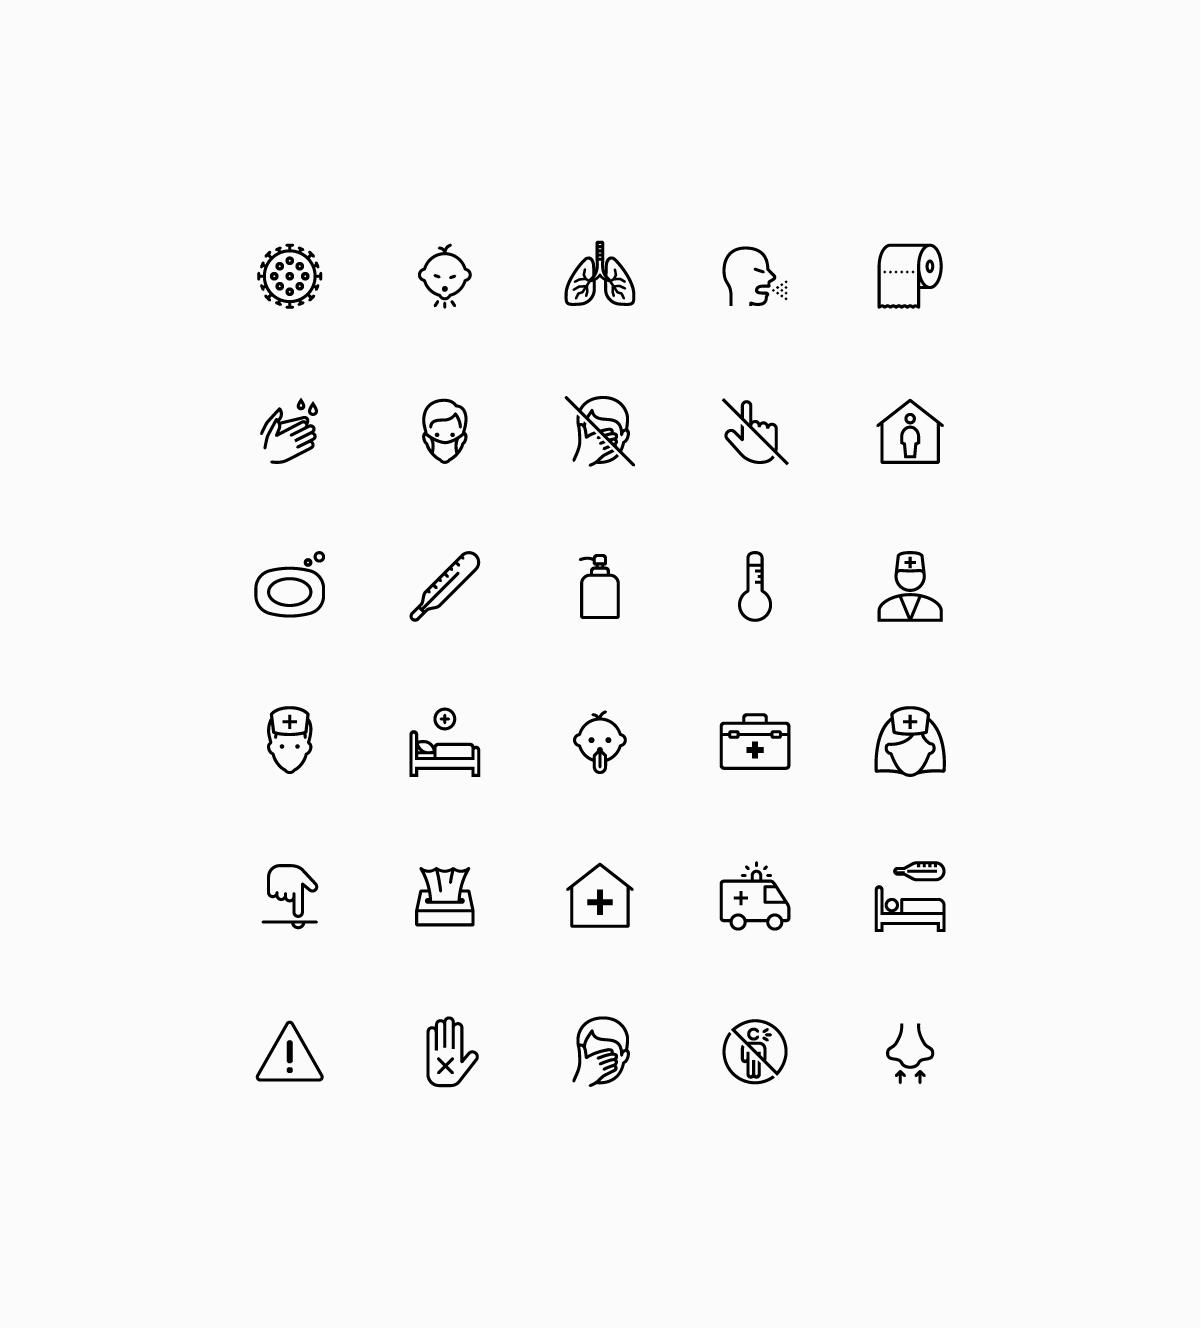 iOS coronavirus icons